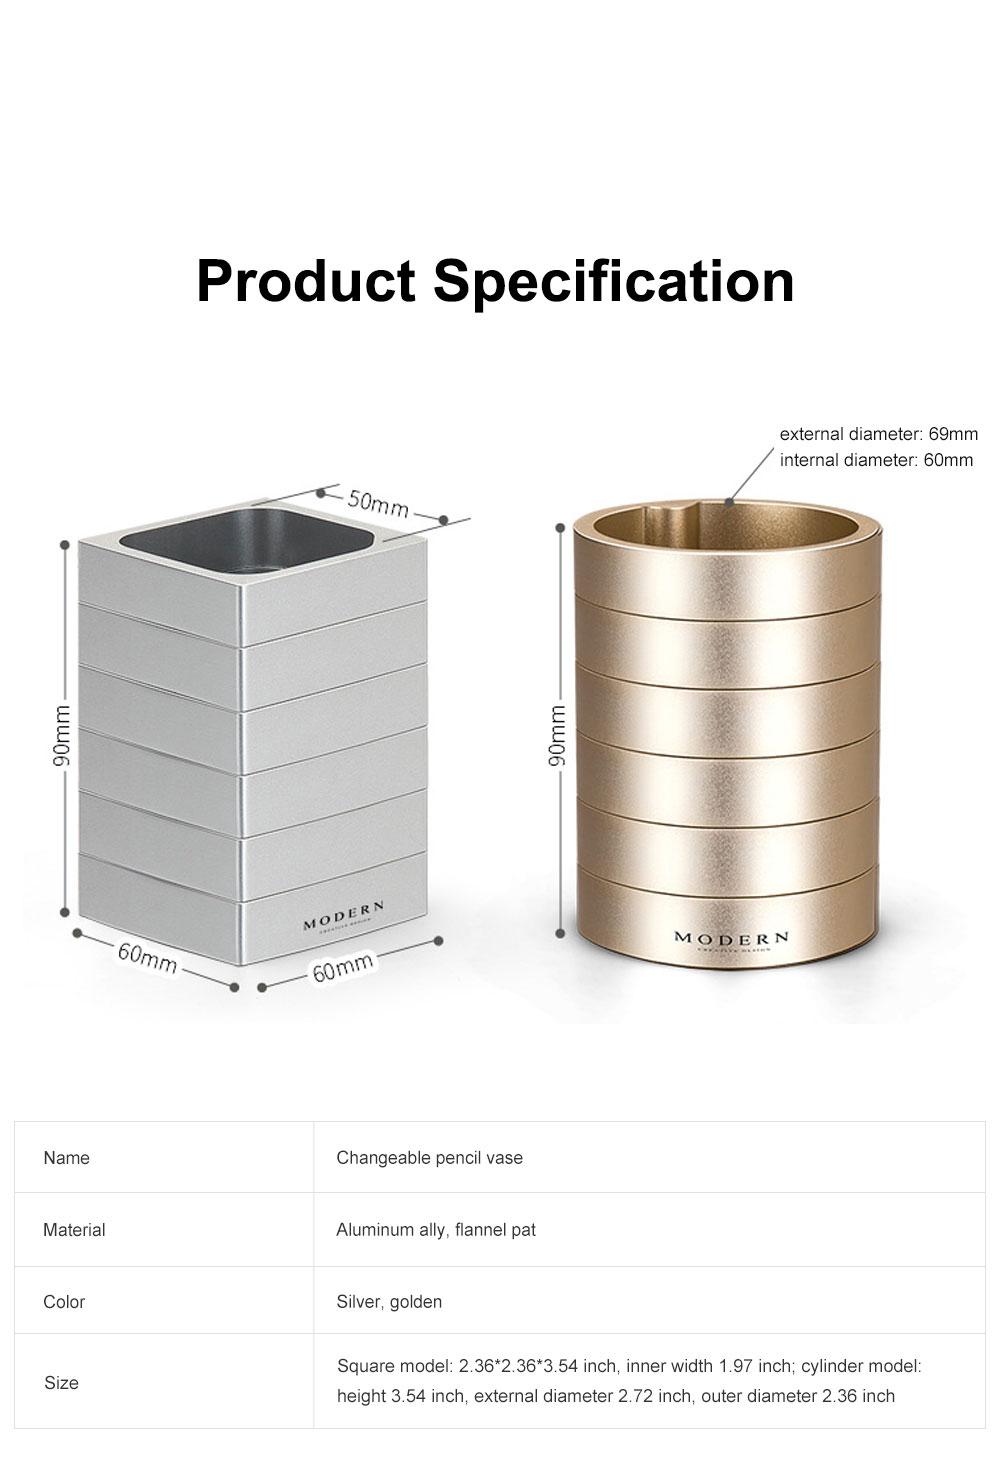 Creative Changeable Model Pencil Vase Brush Pot Office Desktop Ornament Aluminum Alloy Storage Box 6